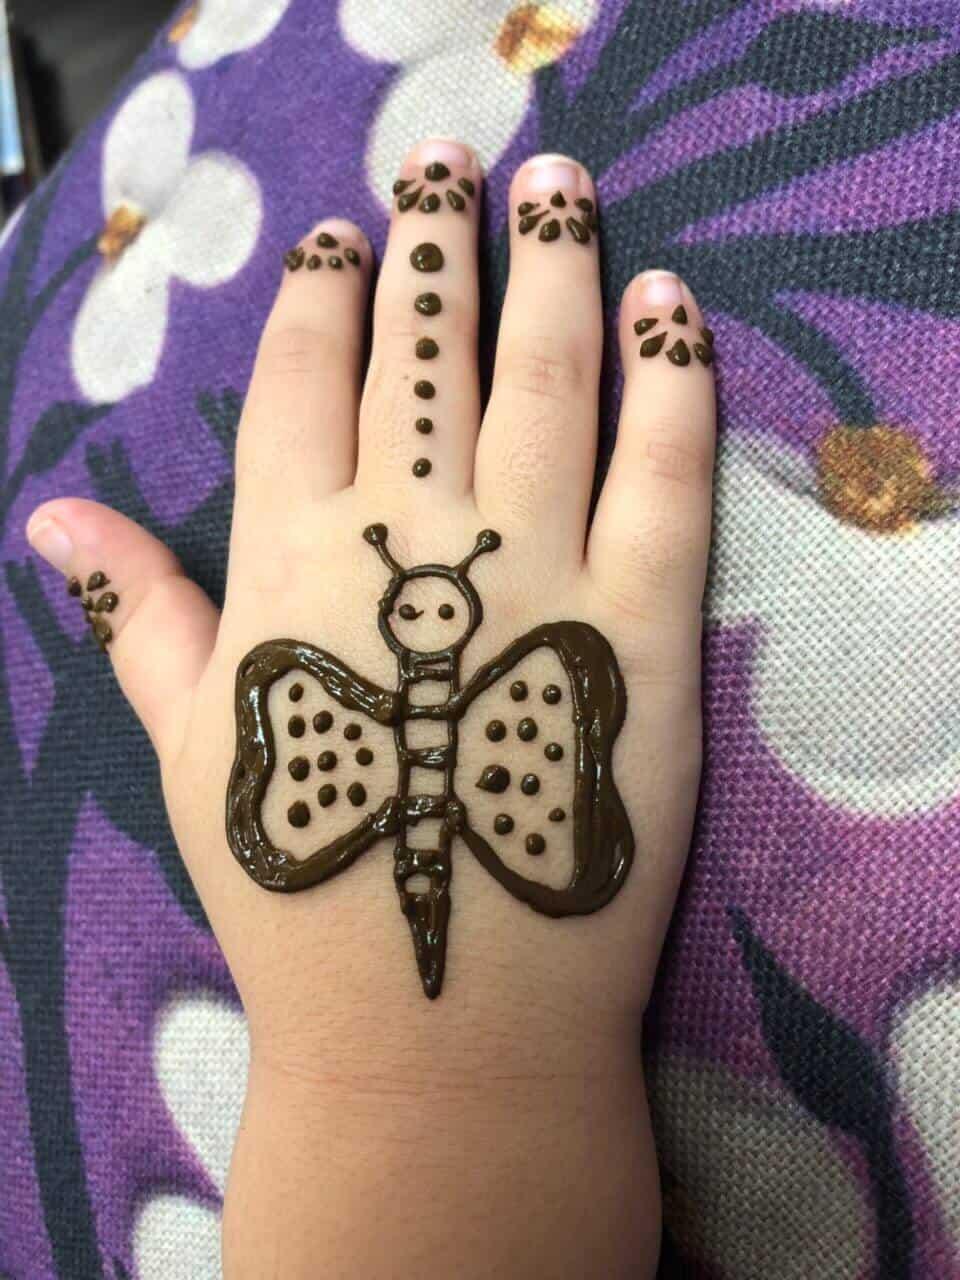 Henna Tattoo Eyebrow Course: Best Henna Tattoo Place In Dallas Fort Worth